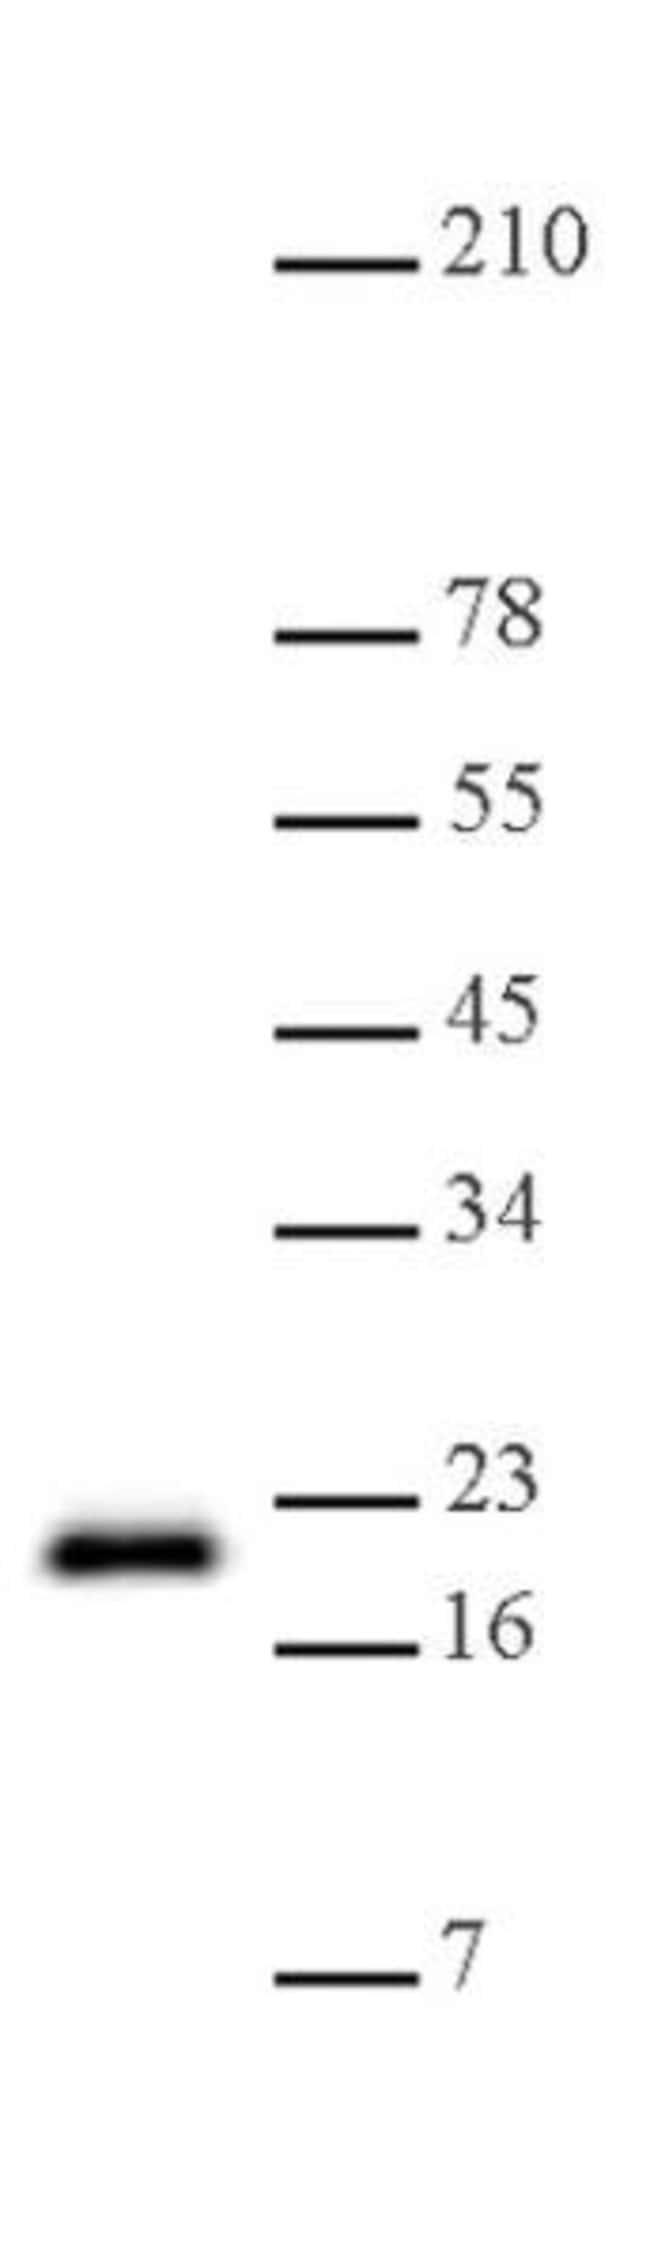 Histone H3K79me1 Rabbit anti-Human, Unconjugated, Polyclonal, Active Motif:Antibodies:Primary